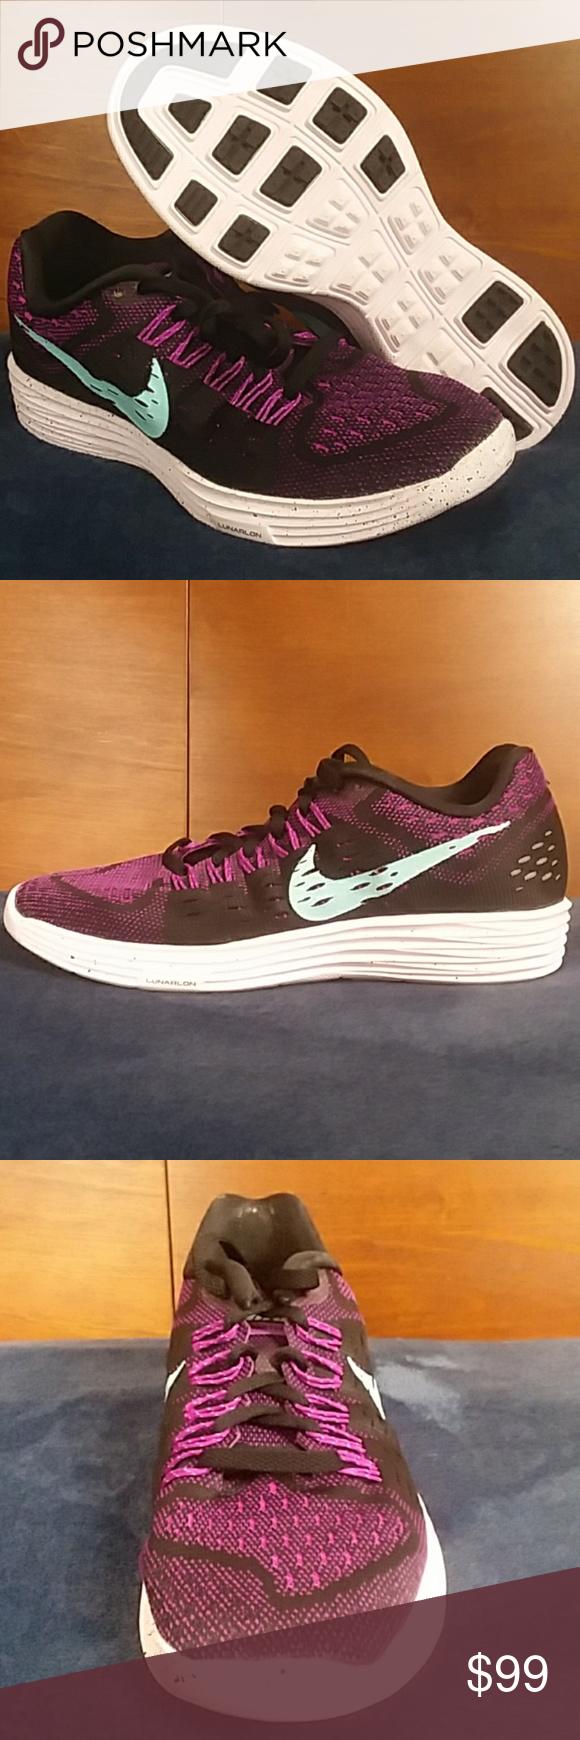 lowest price 2513f ca8cd Nike Lunartempo Vivid Purple Copa Womens Size 6